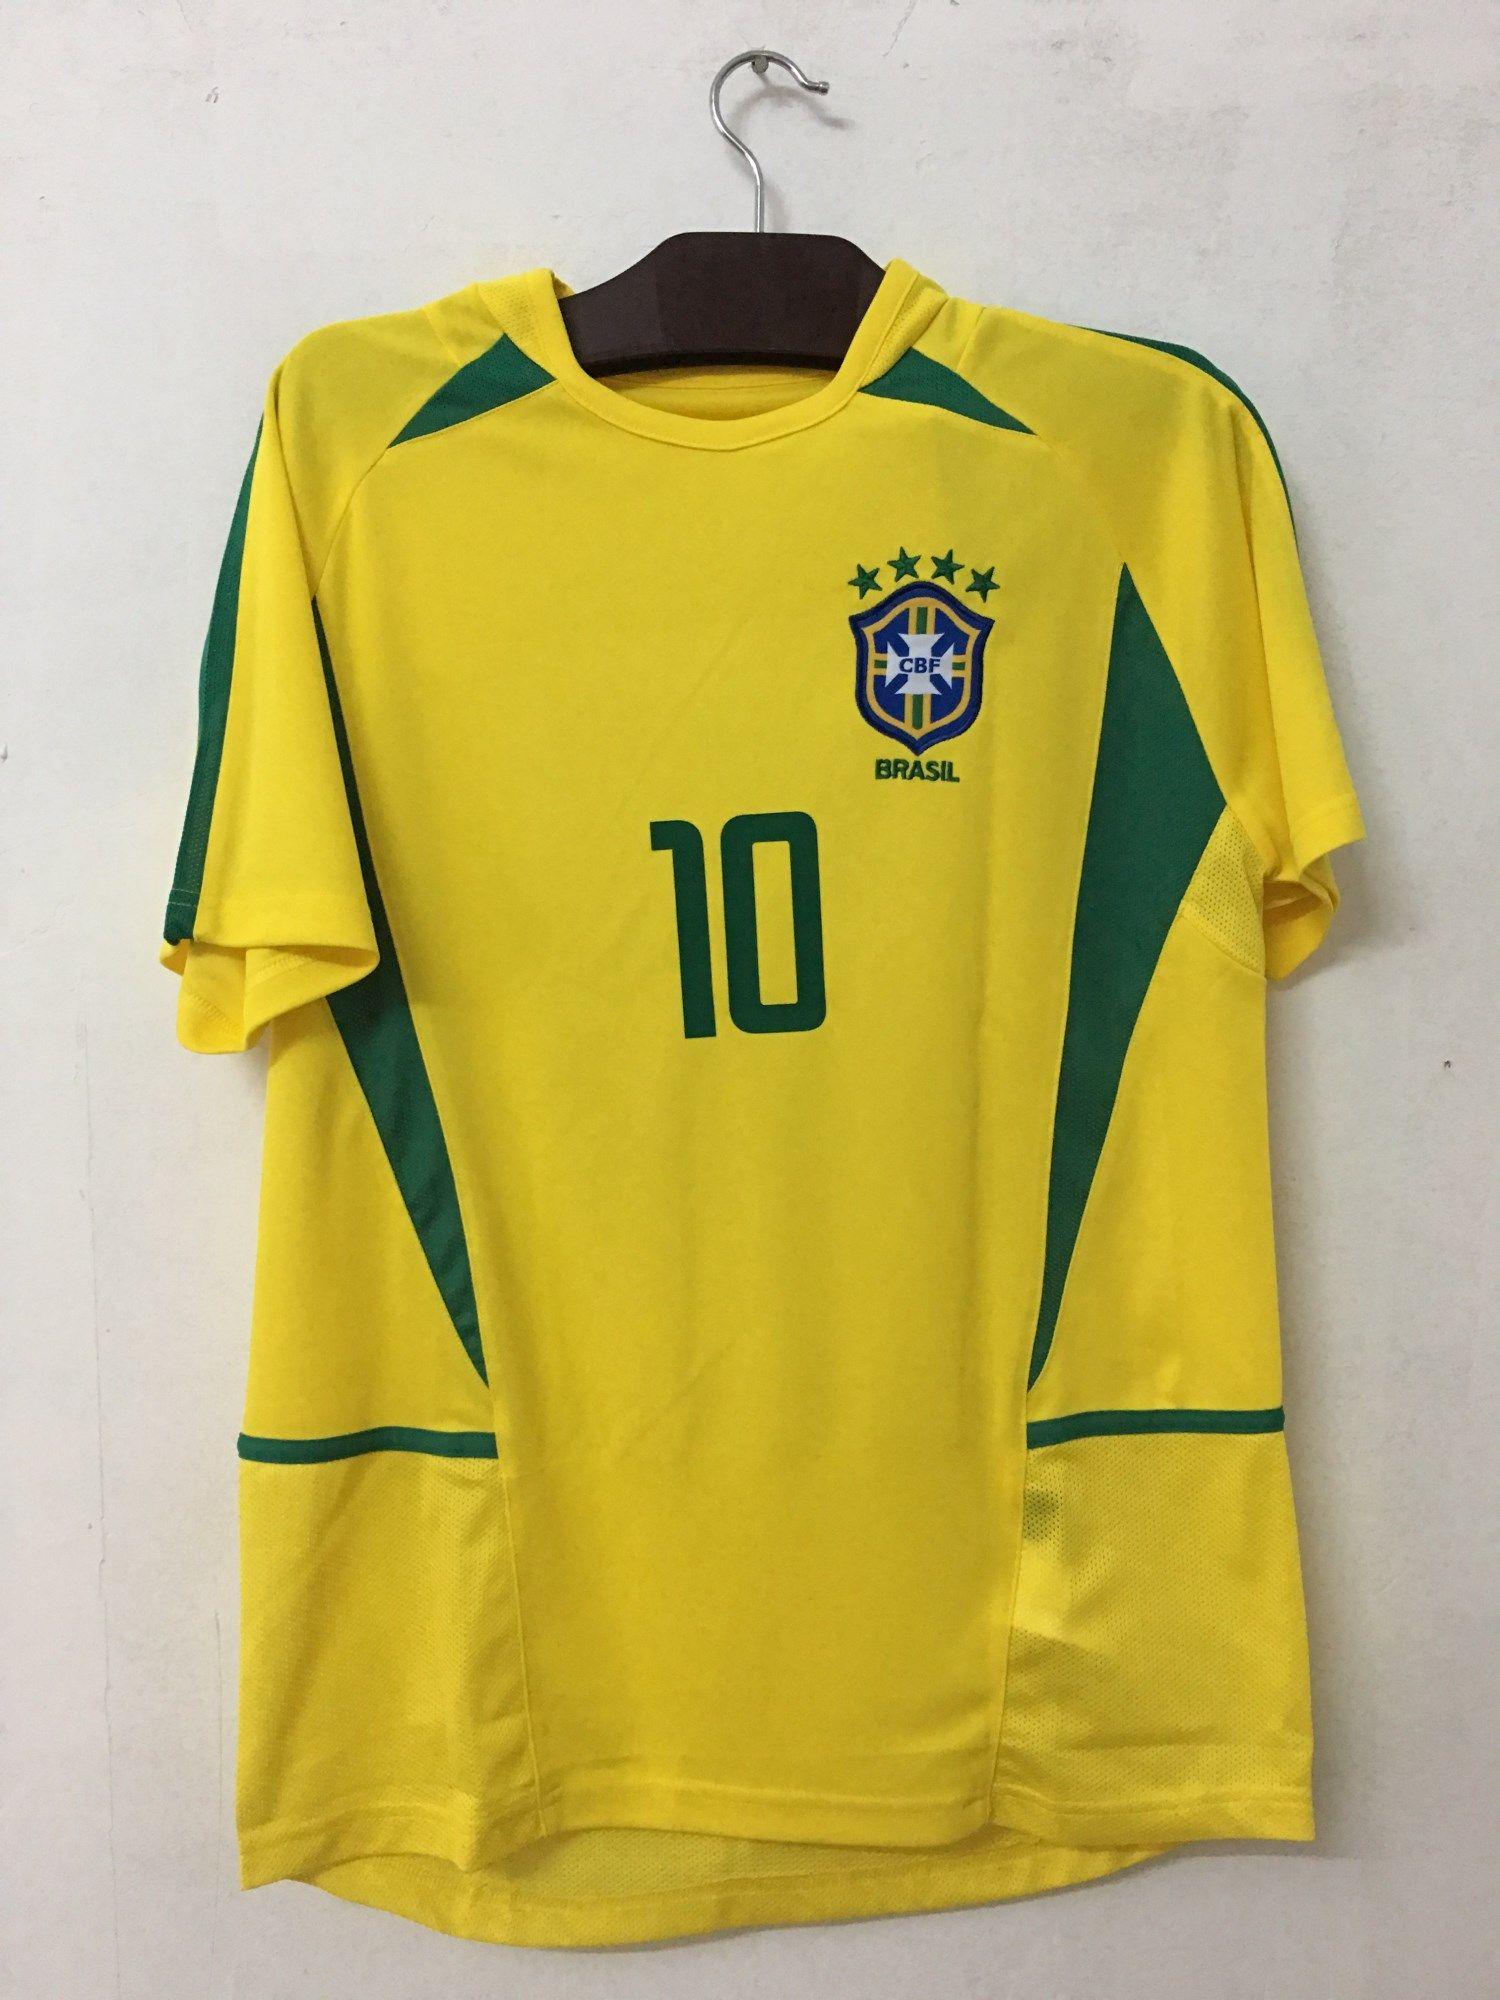 2019 2002 World Cup Brasil 9  10  RIVALDO Home Retro Jersey Classic Jersey  BRASIL RETRO VINTAGE CLASSIC 11  RONALDINHO Football Shirt Unifor From  Spark831 64e21373e